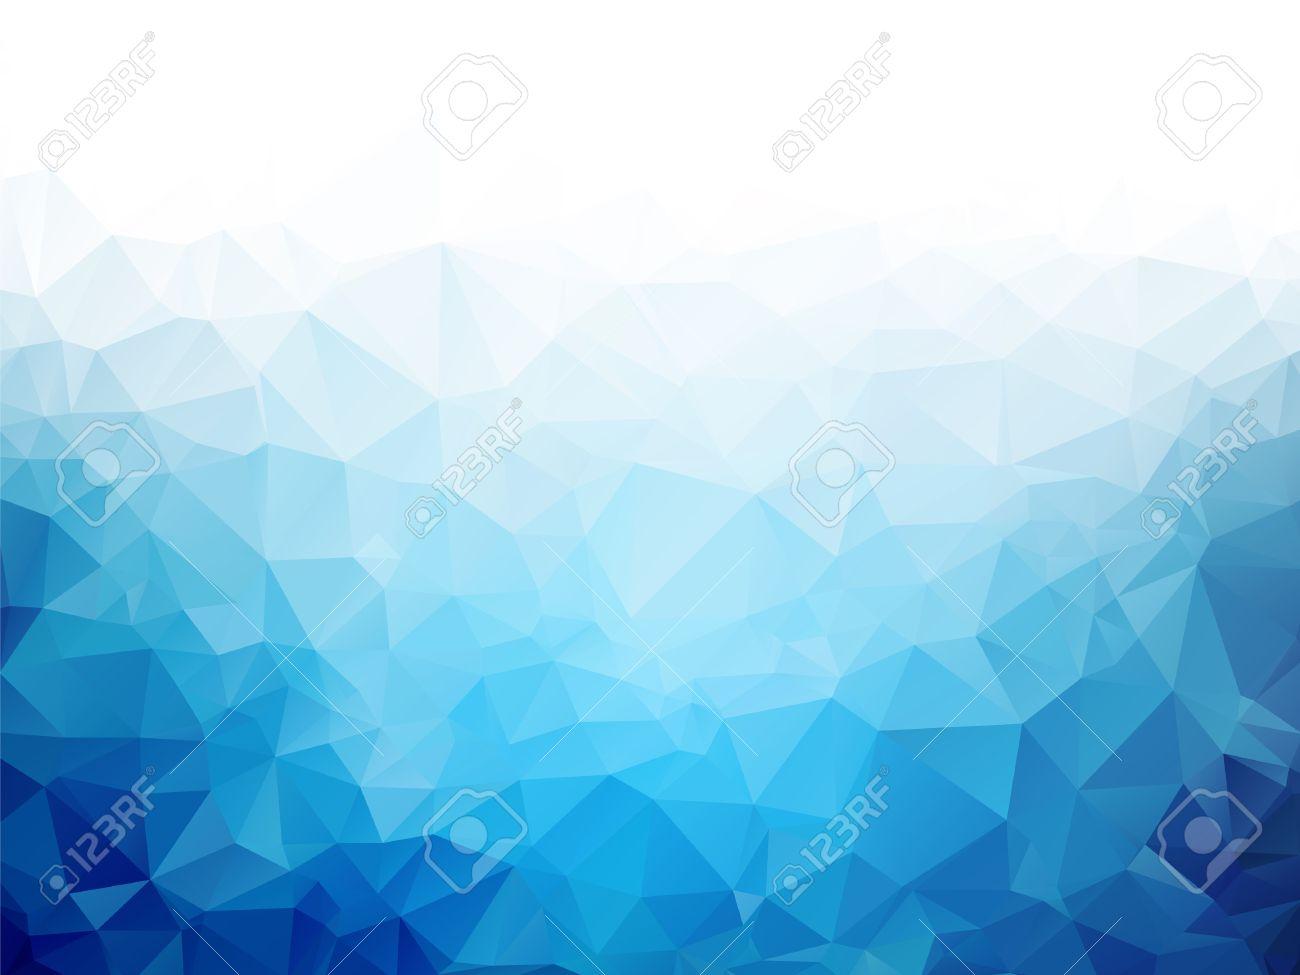 Geometric blue ice texture background - 52533475